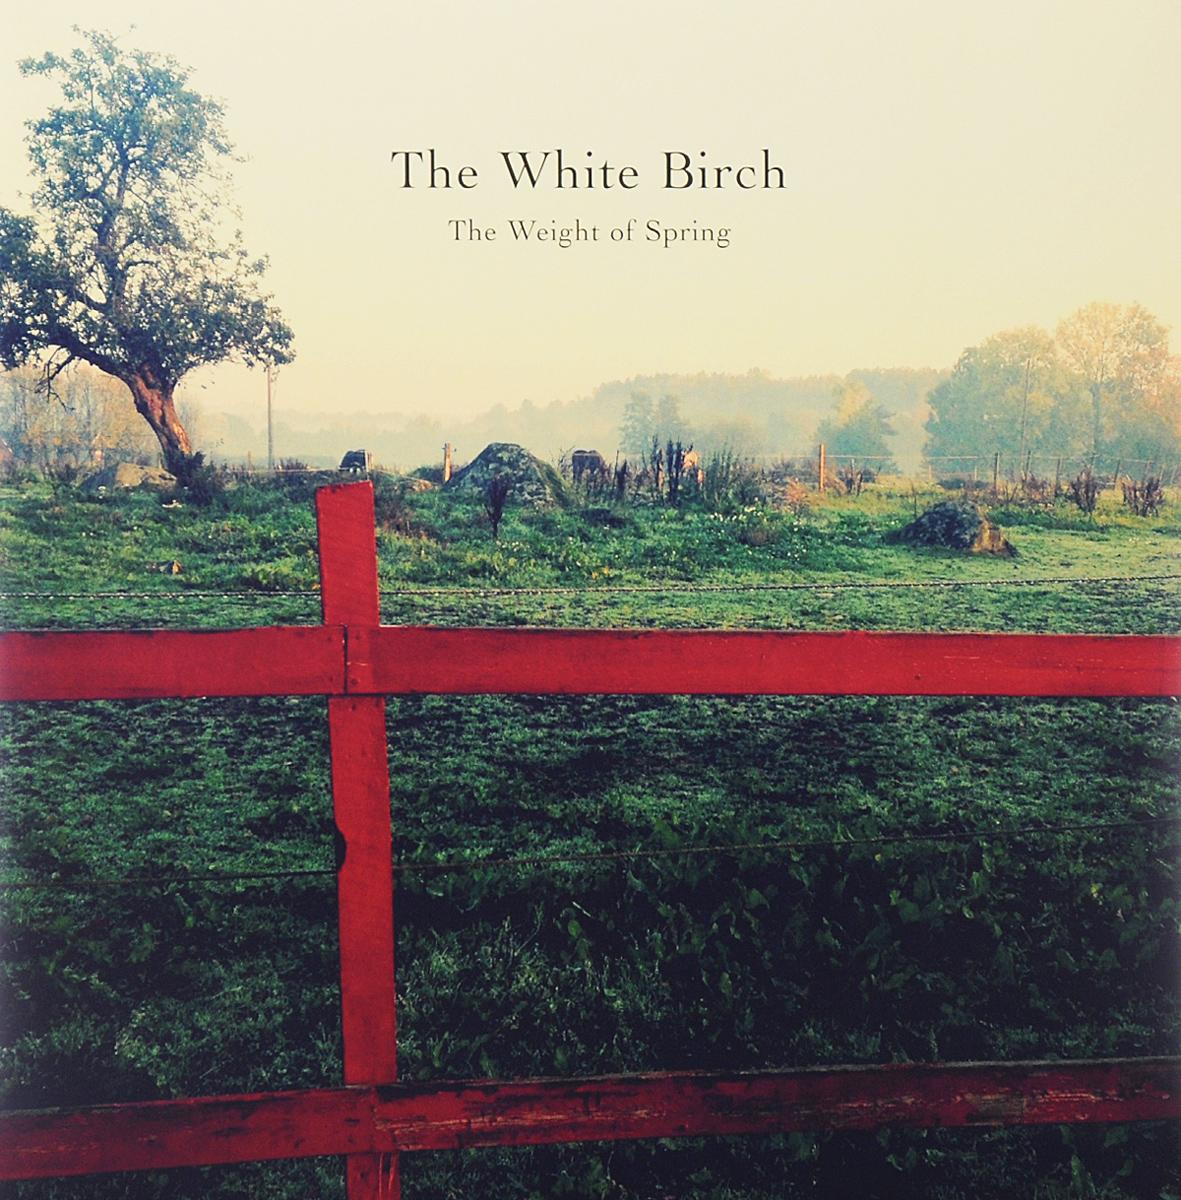 The White Birch The White Birch The Weight of Spring 2 LP + CD